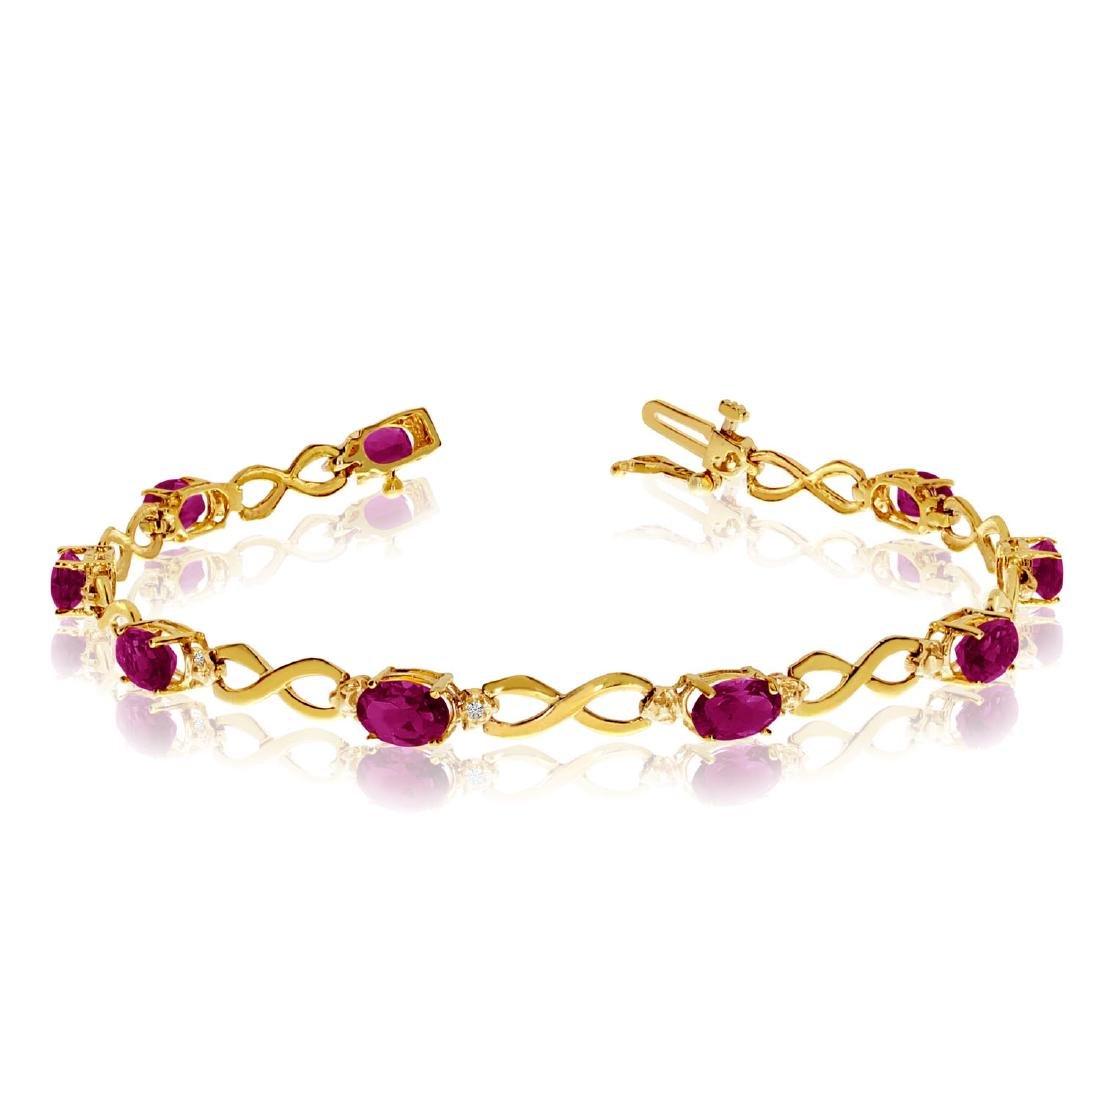 Certified 10K Yellow Gold Oval Ruby and Diamond Bracele